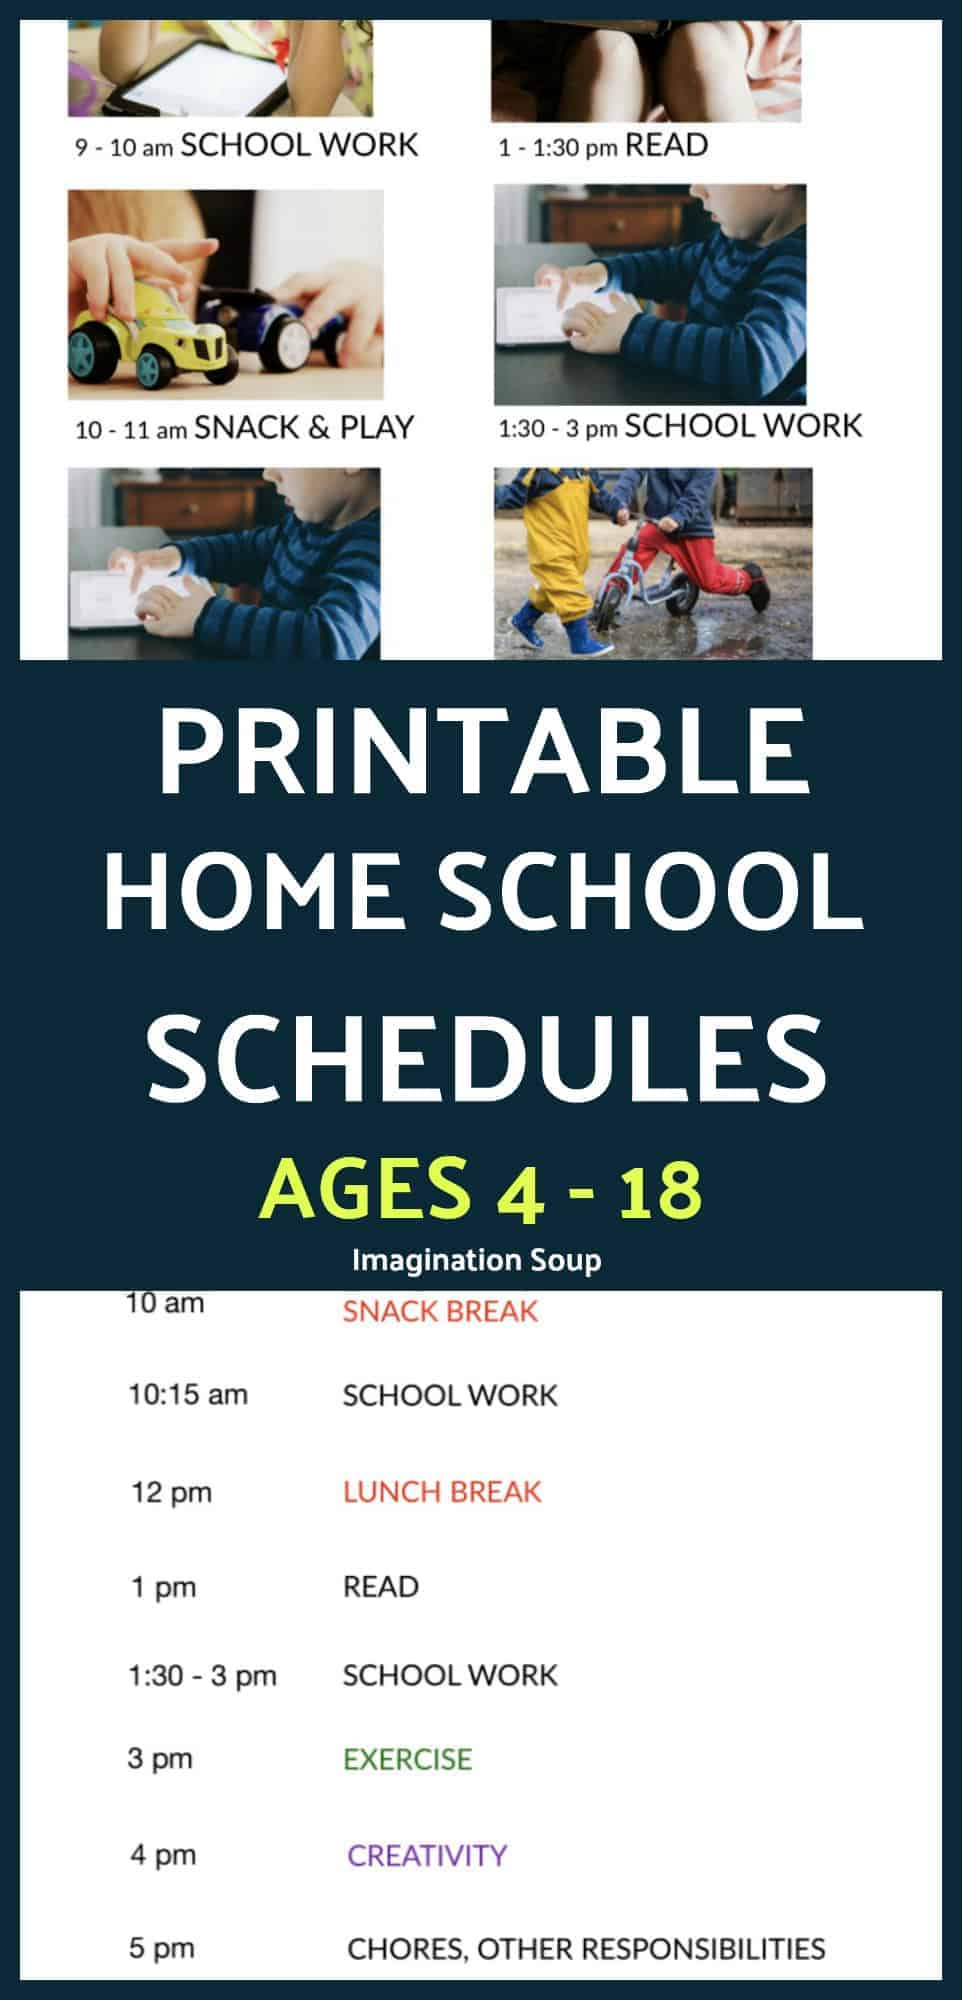 printable home school schedules for prek to high school kids